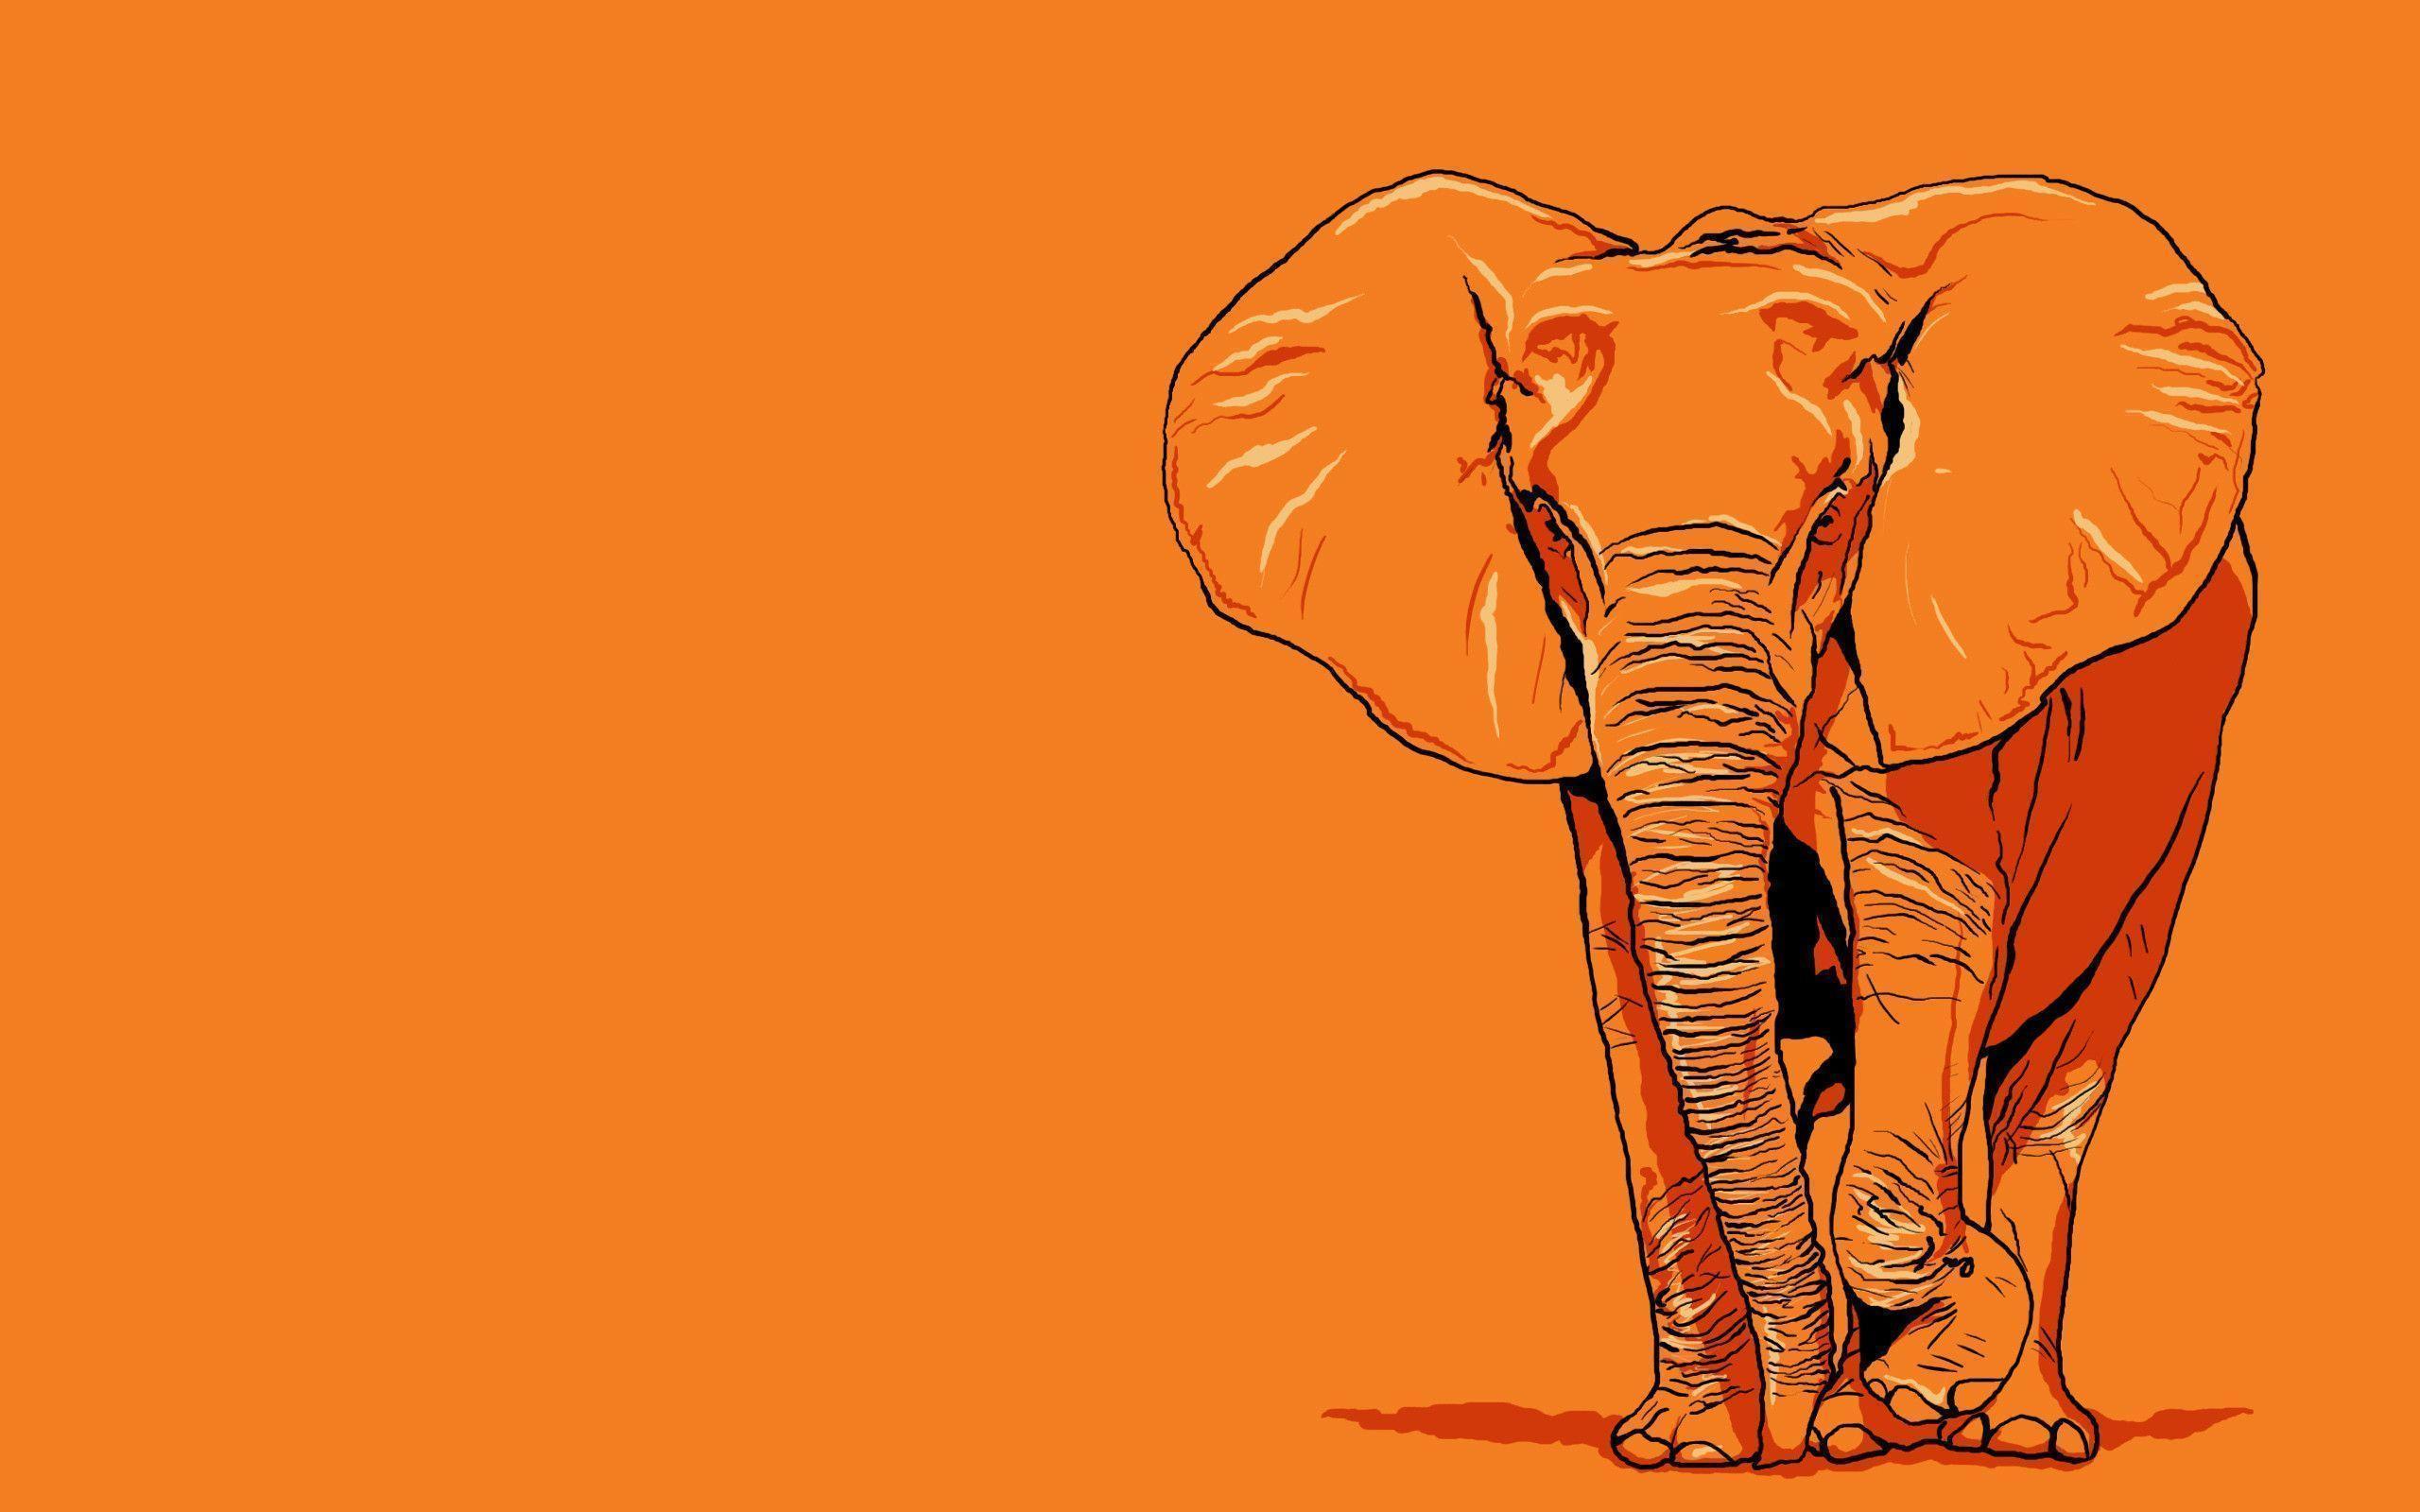 Elephant Wallpaper Art - Animal Wallpapers (7112) ilikewalls.